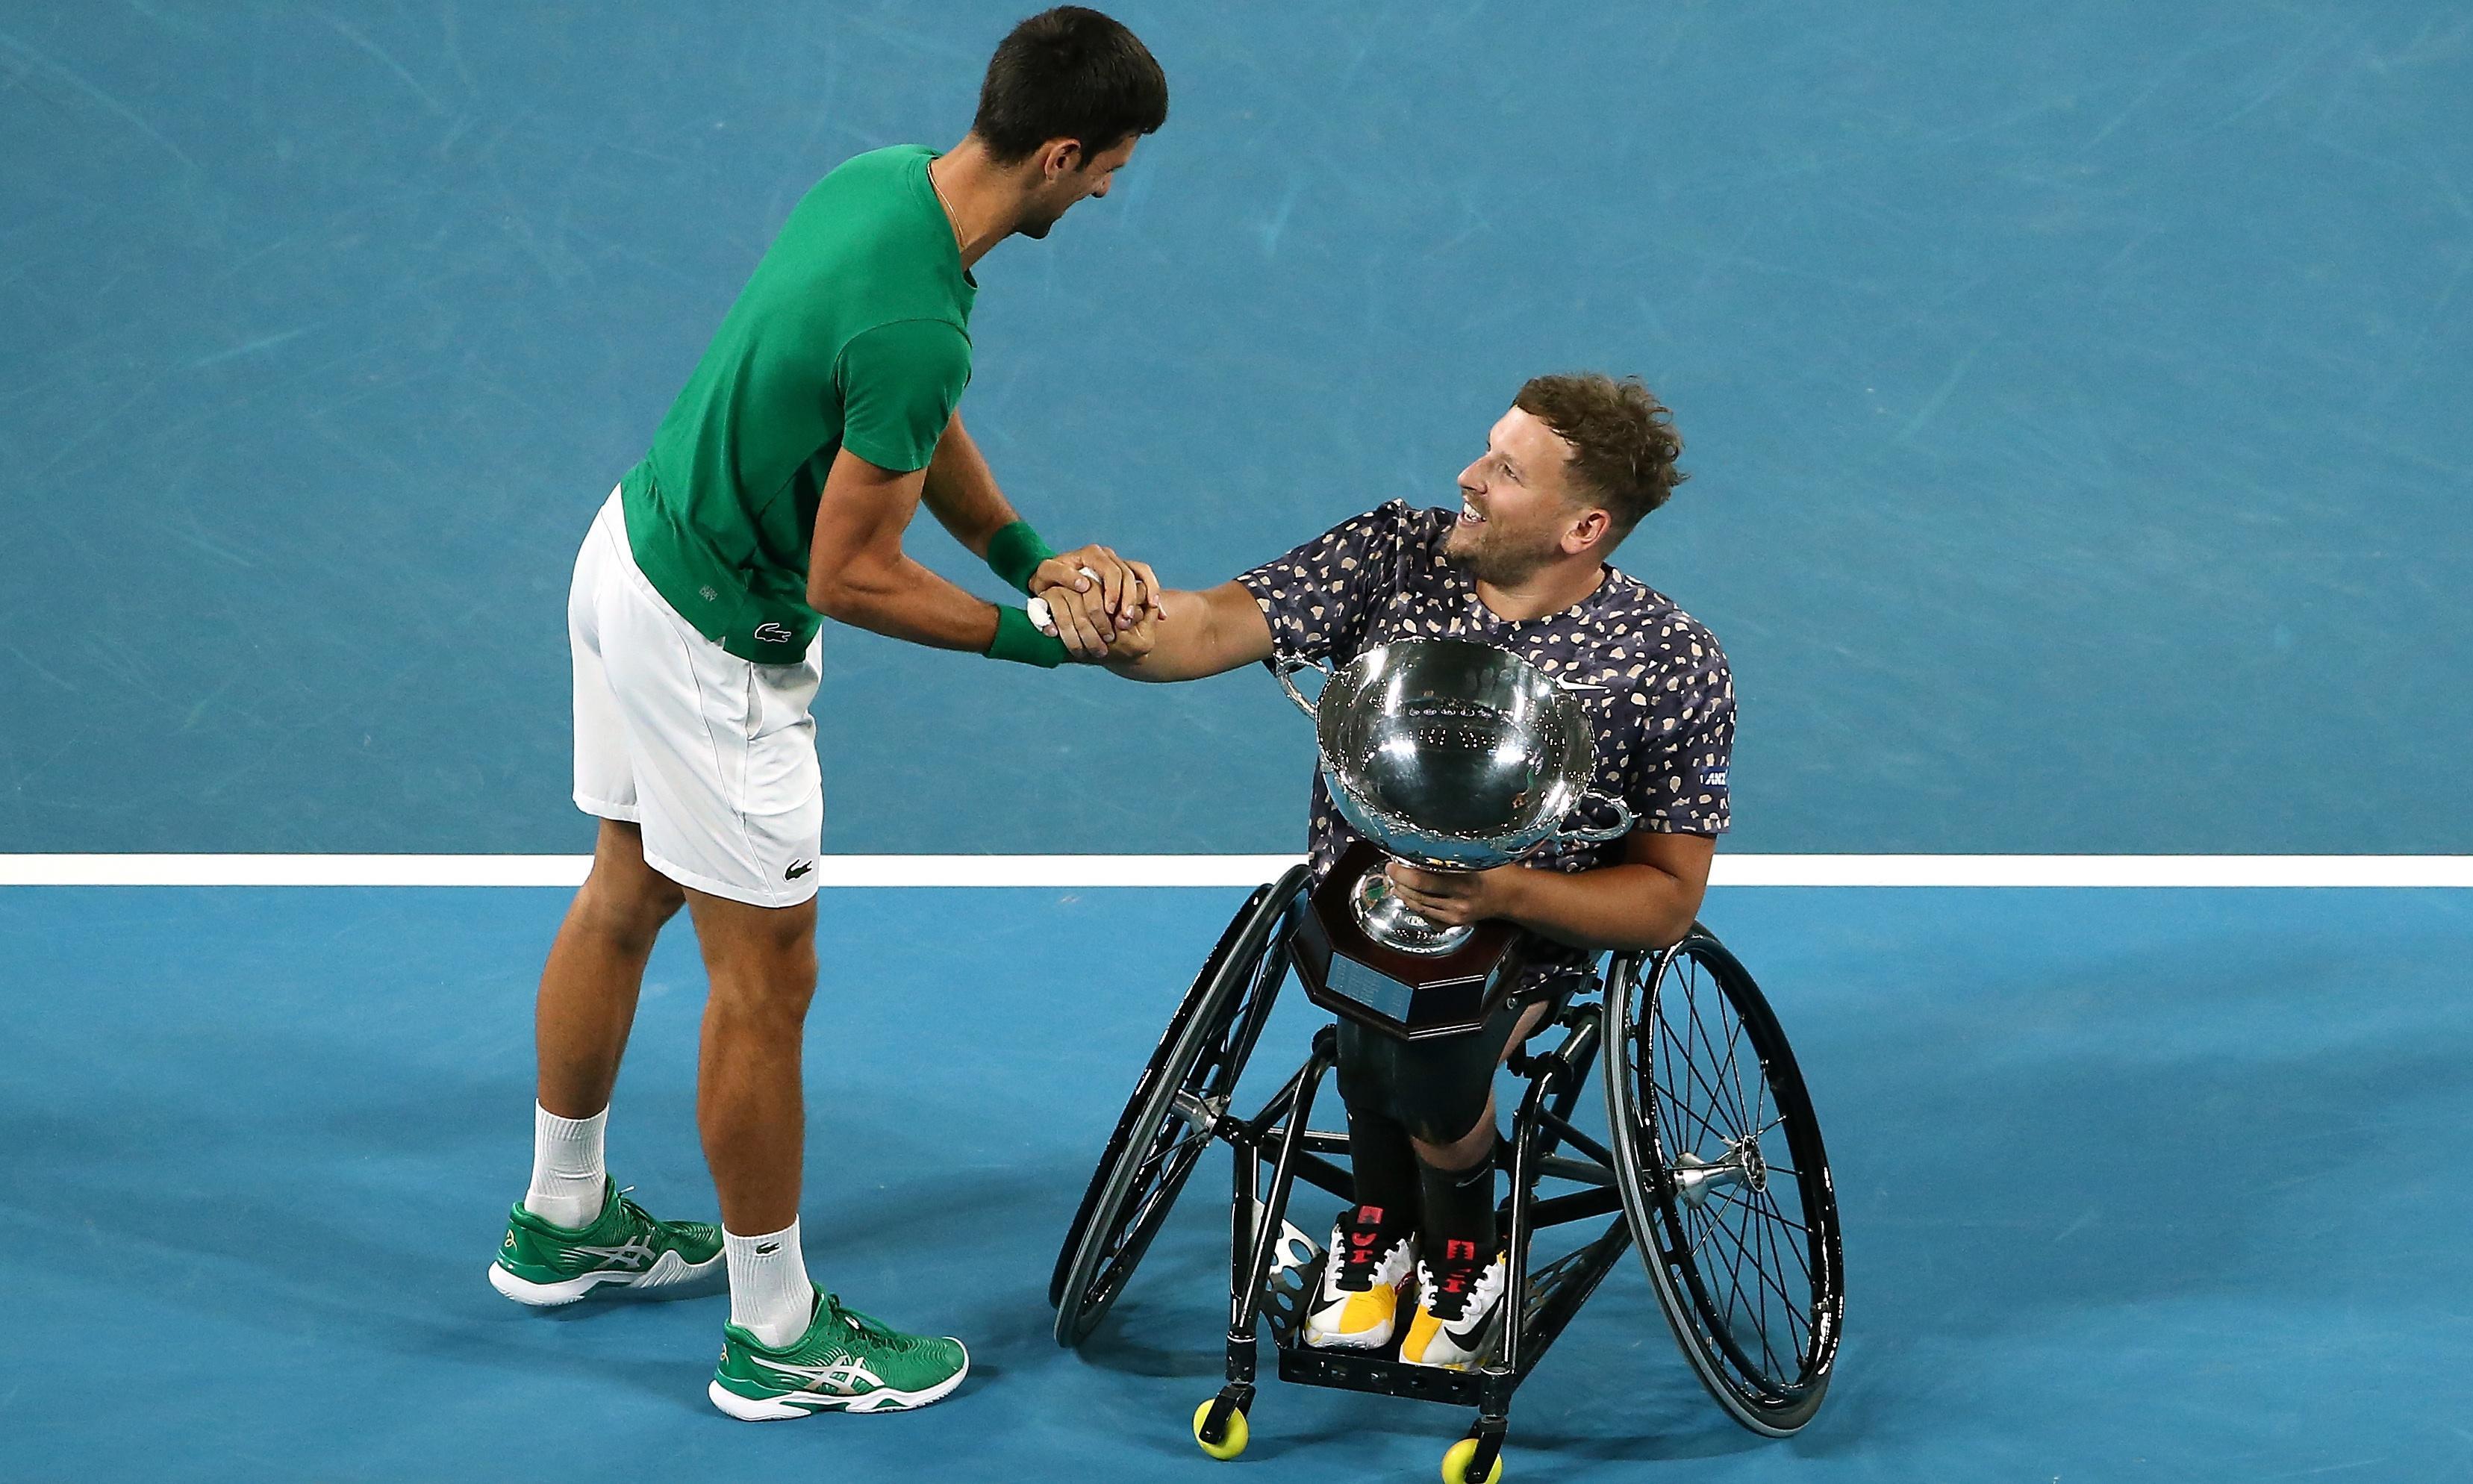 Dylan Alcott wins sixth straight Australian Open quad wheelchair title